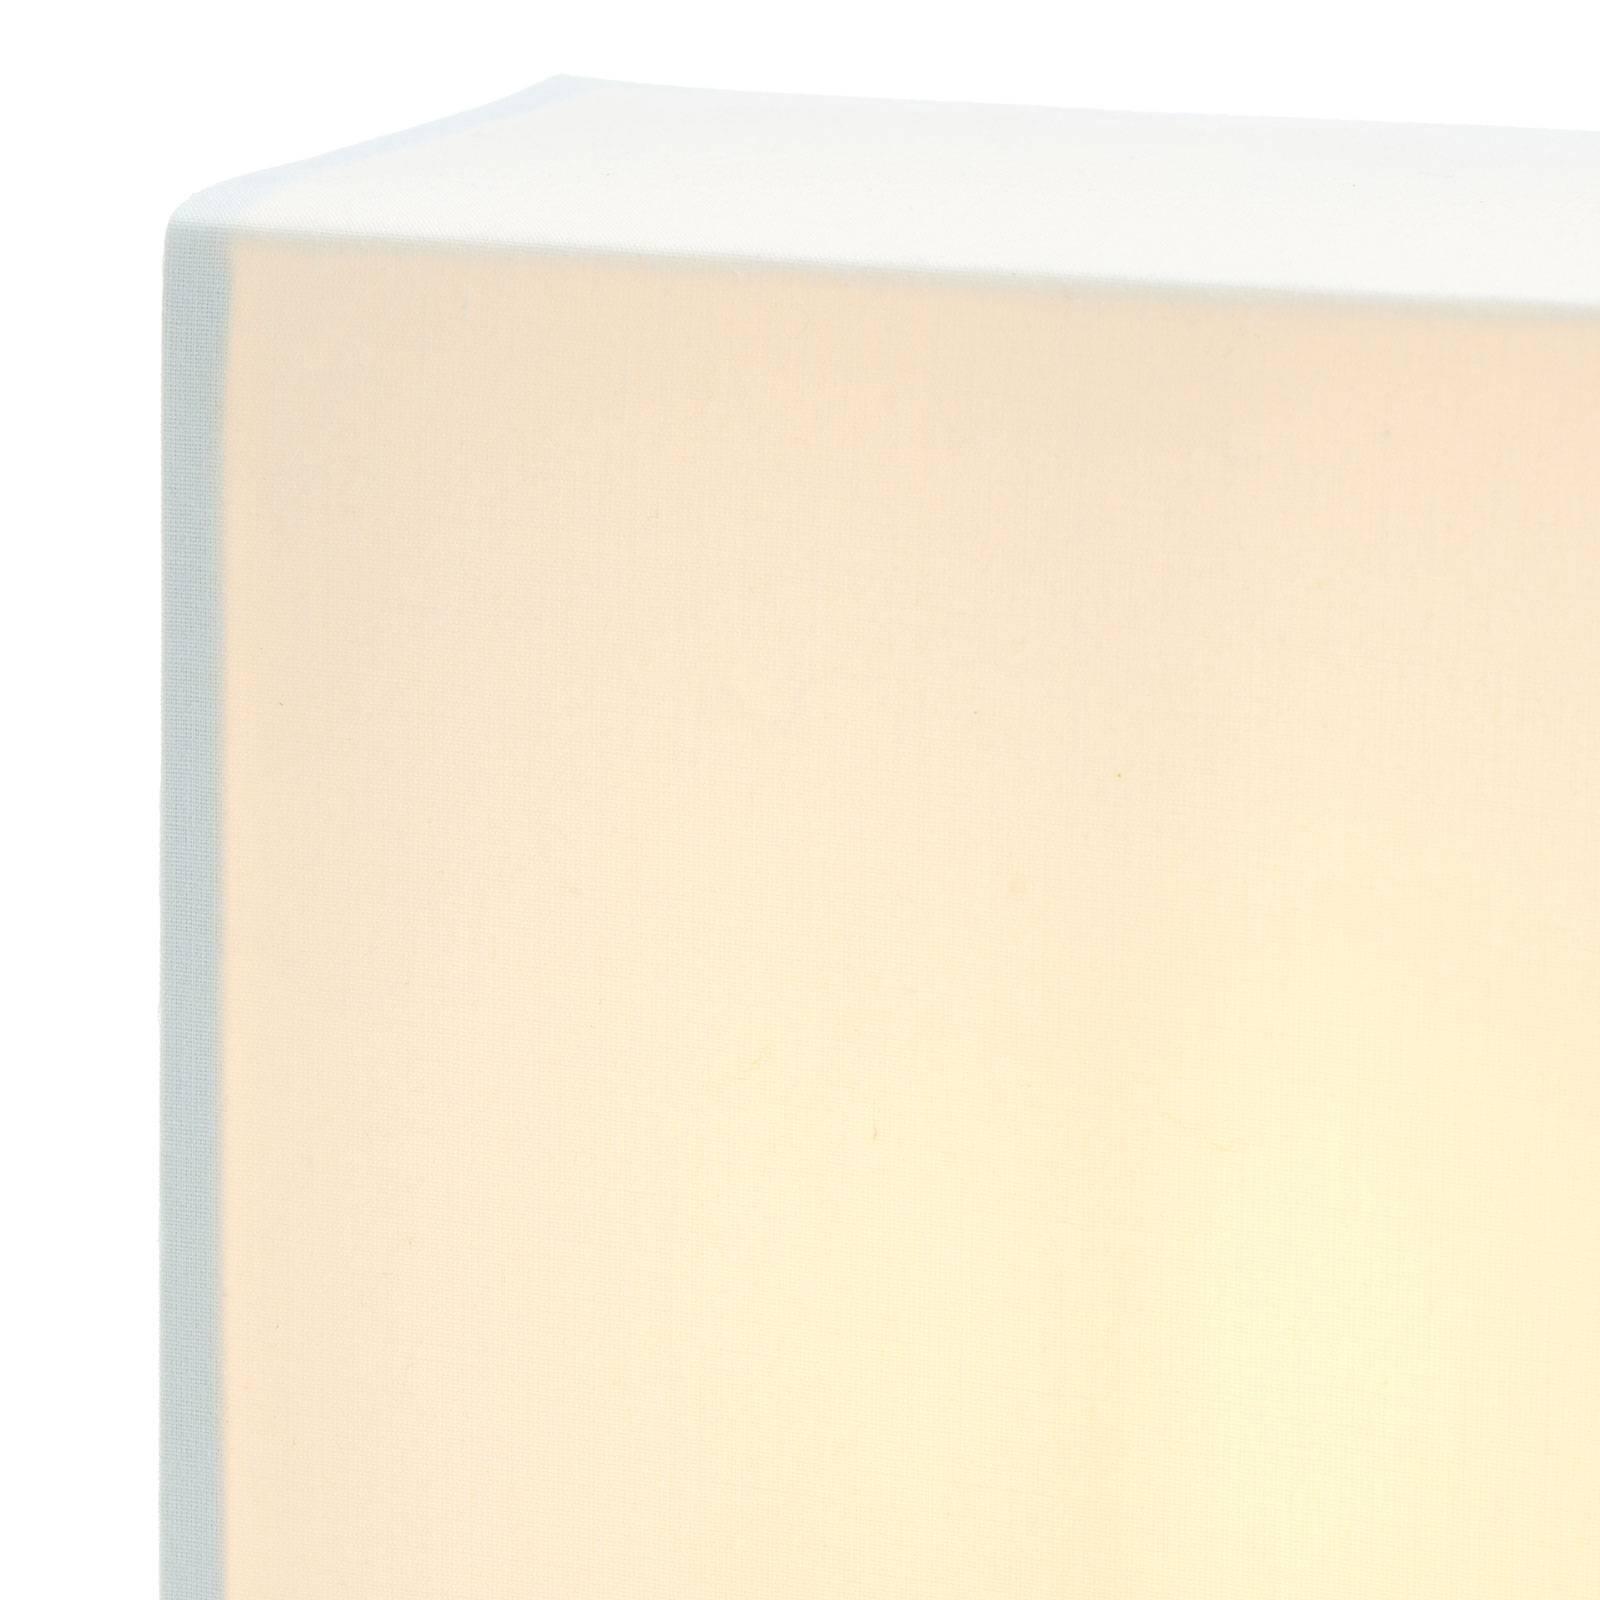 Lucande Patrik -seinävalo kulmikas 22 cm kerma